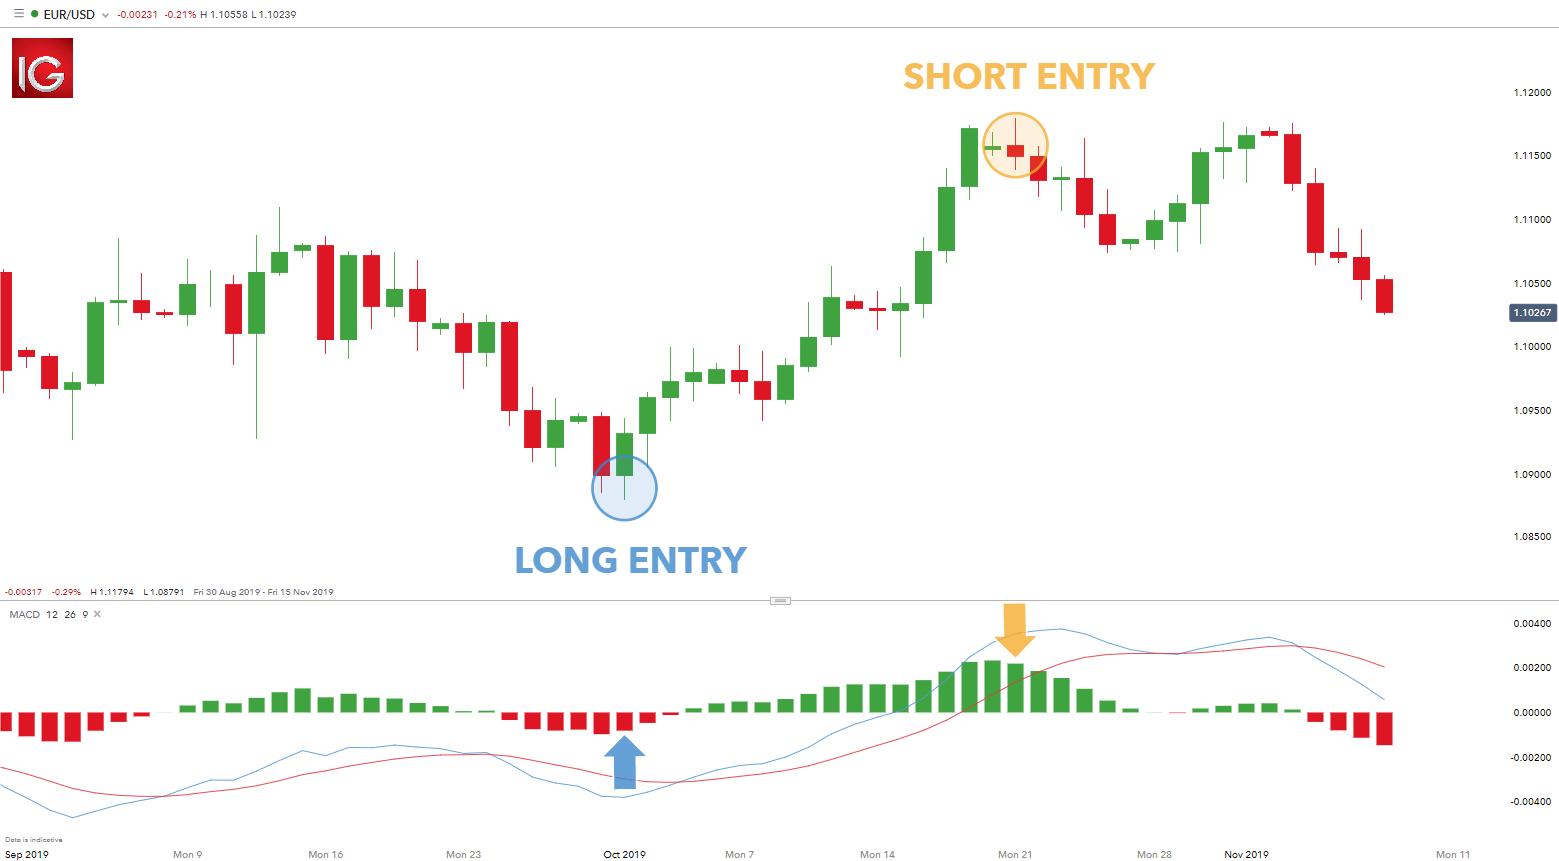 macd histogram trading strategy